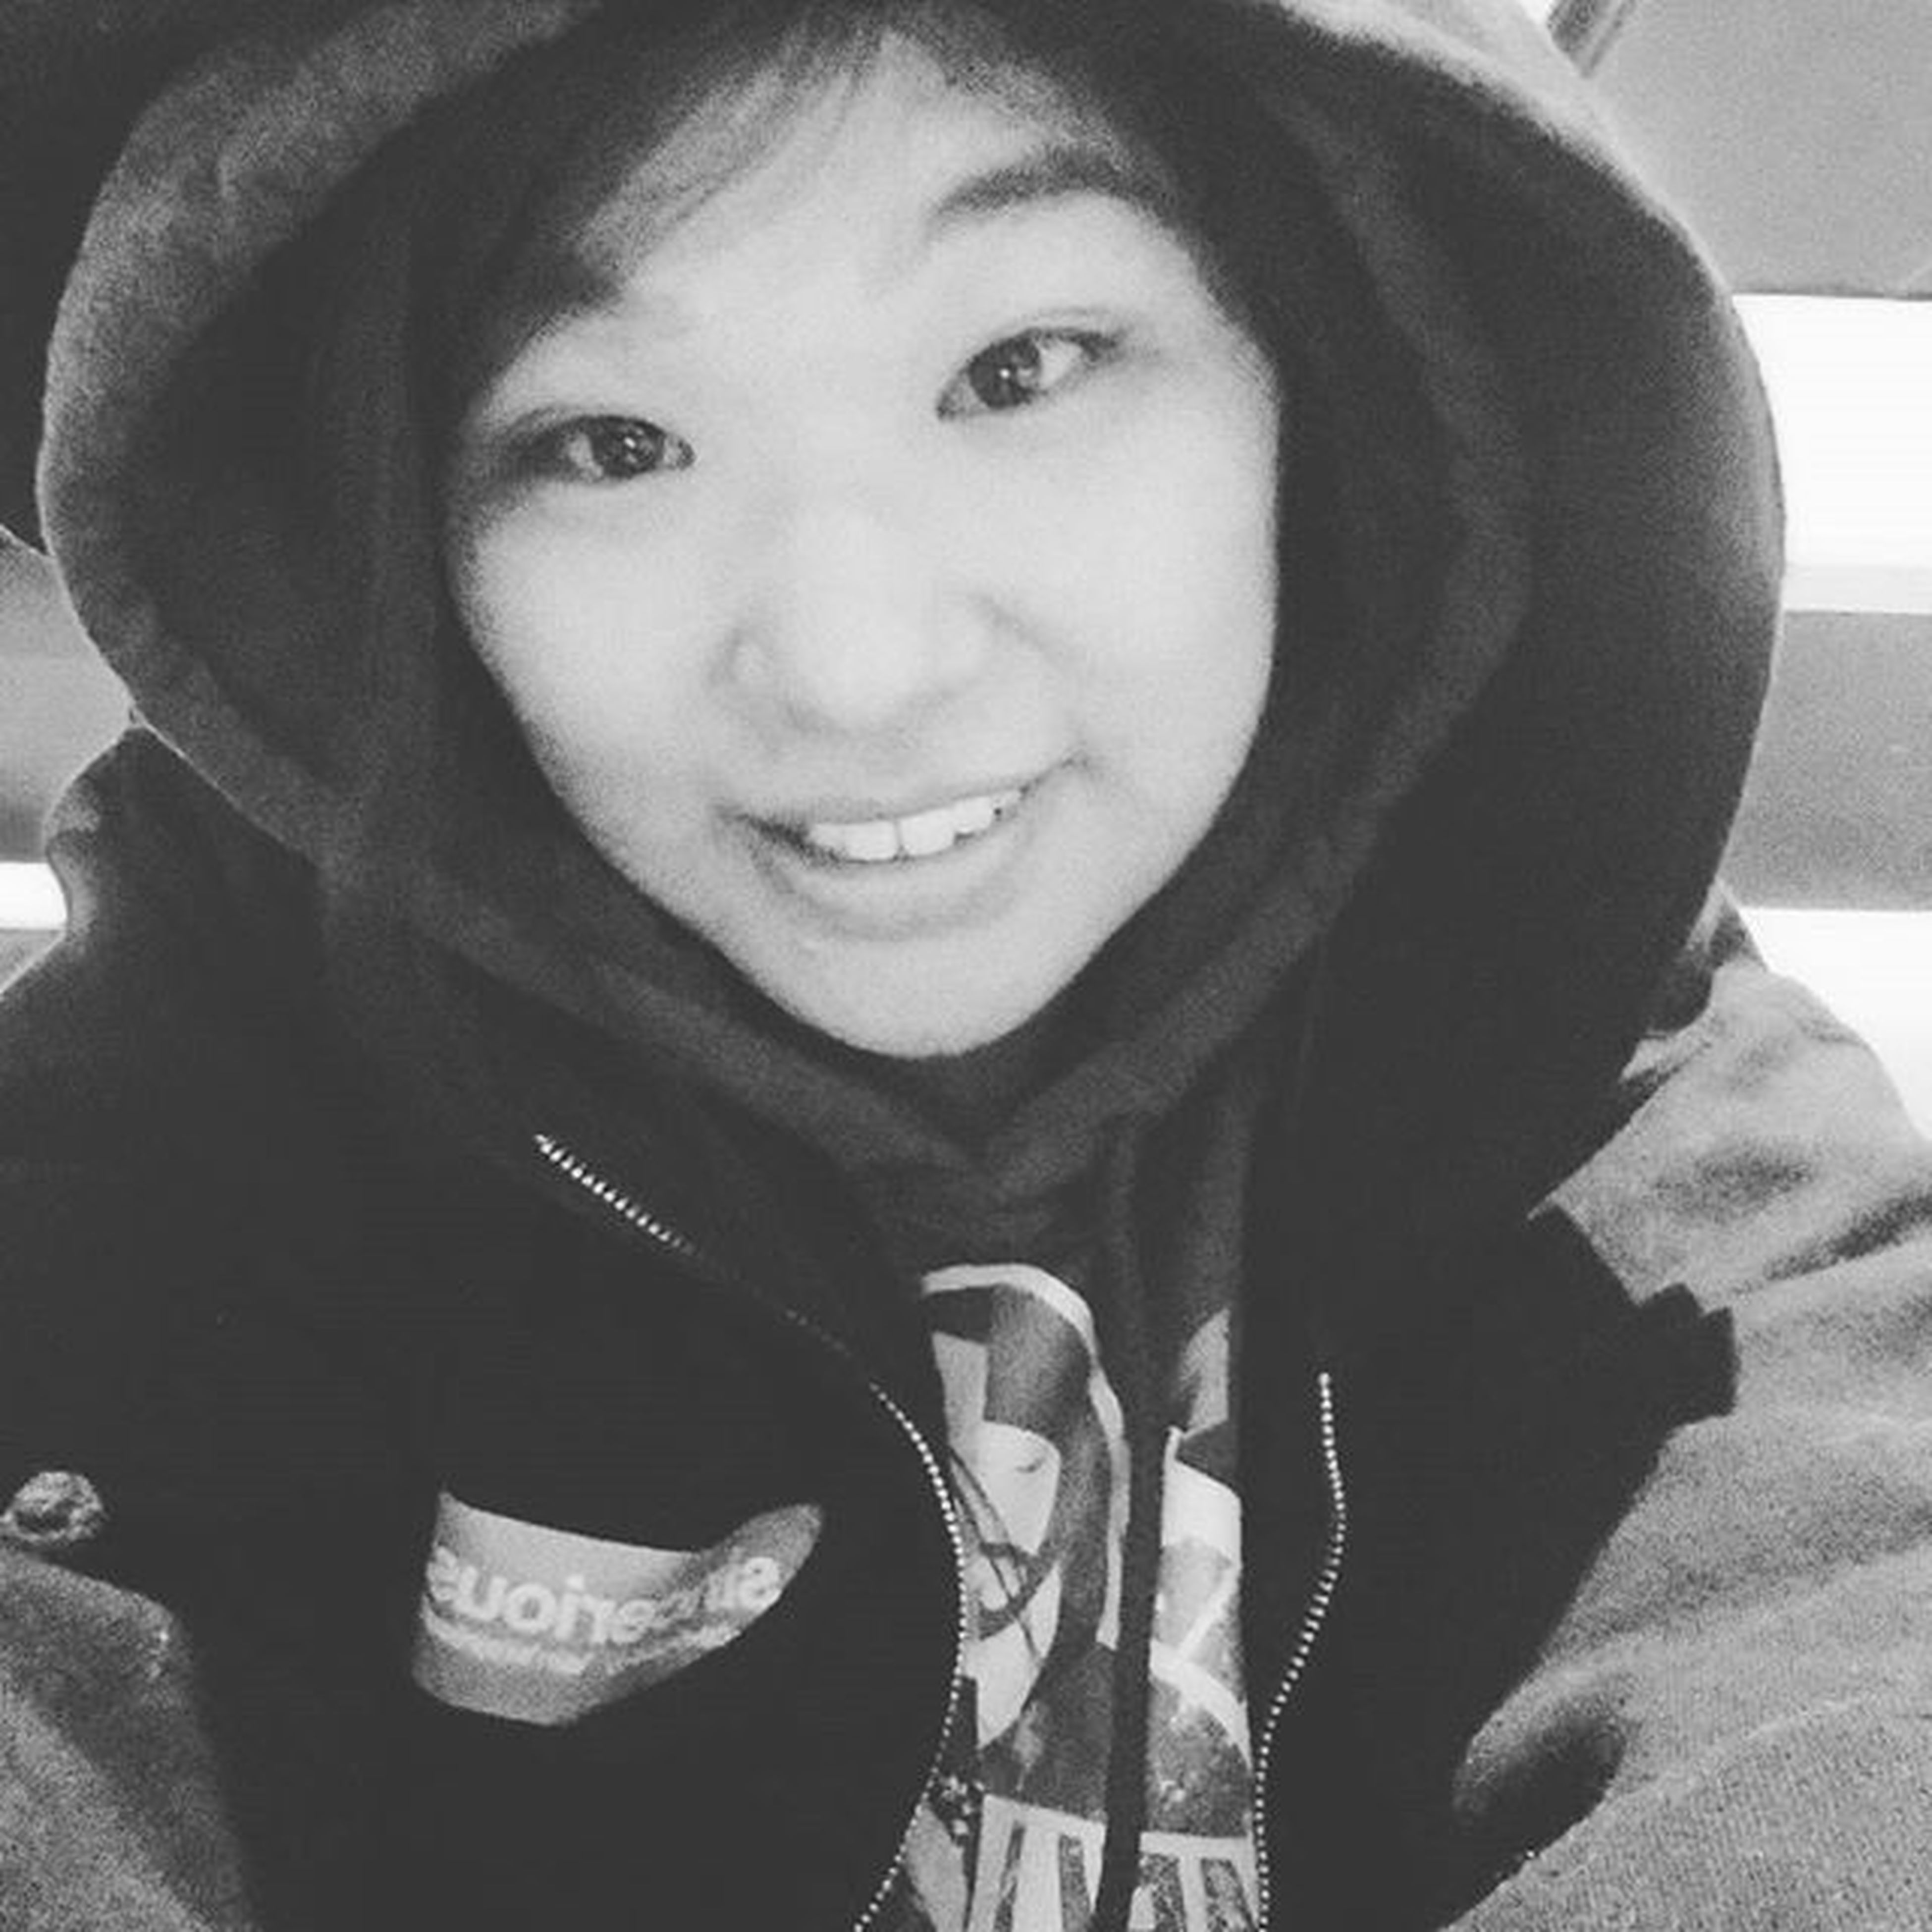 Wearing two hoodies n I'm still so cold!! 😣 where r my Cuddlepuddlebuddies at 😁😂 @brianaevigan @yonatanmonster